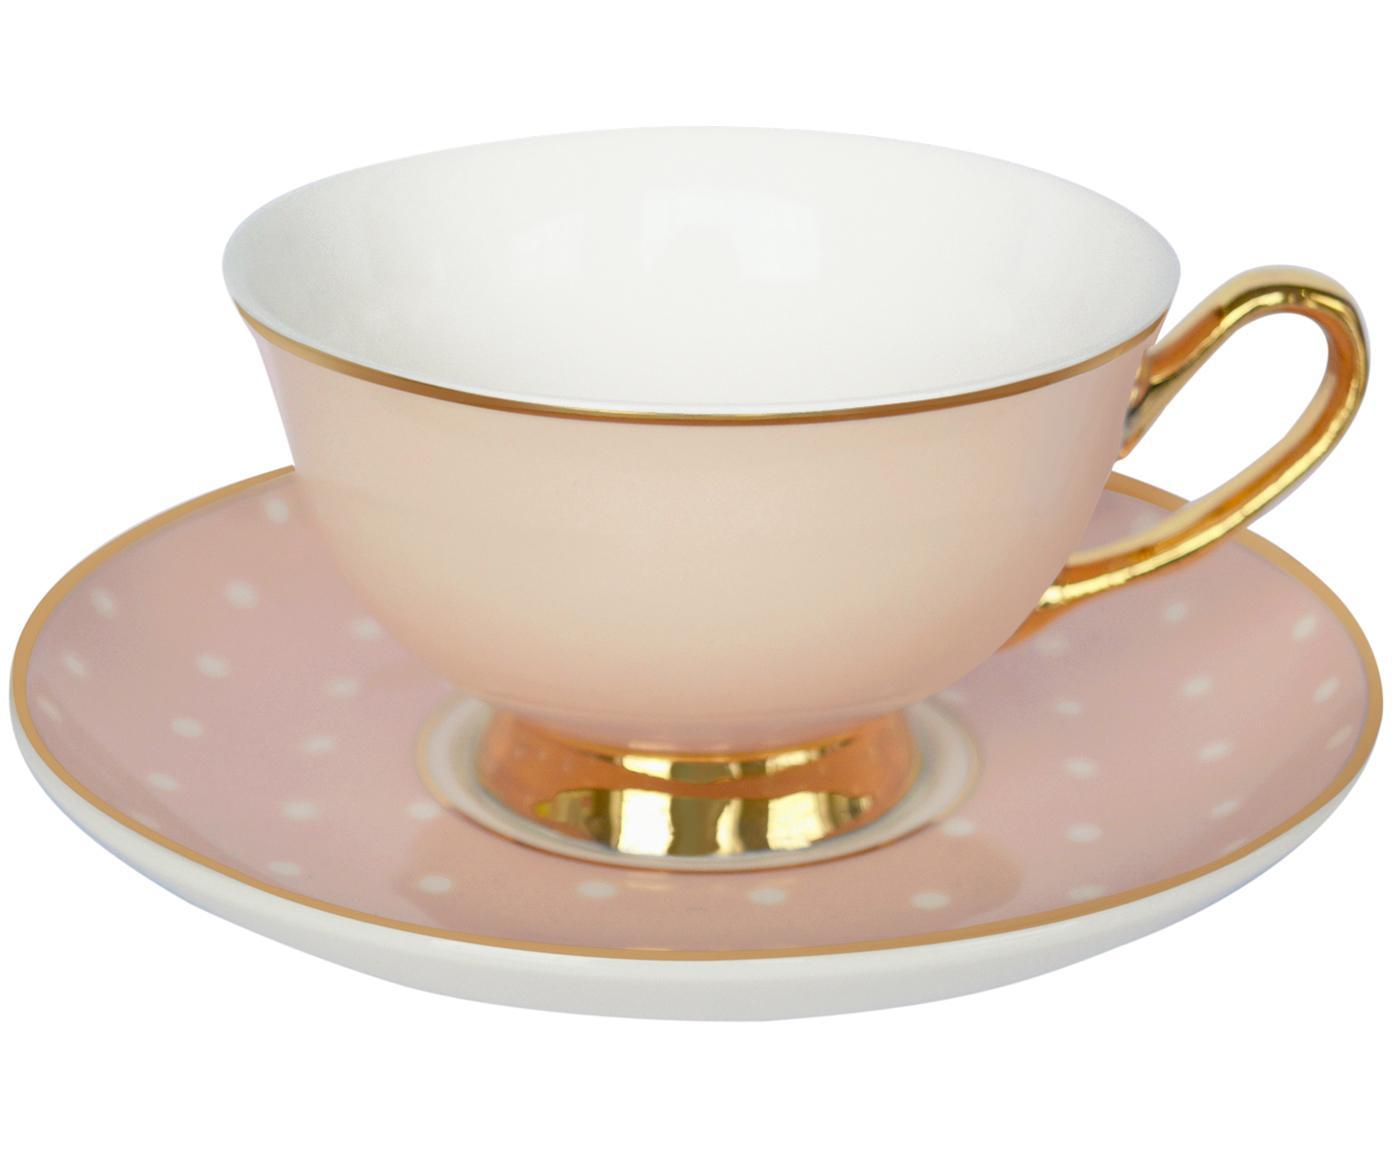 Taza de té con platillo Spotty, Porcelana fina, dorada, Rosa, blanco Borde y asa: oro, Ø 15 x Al 6 cm